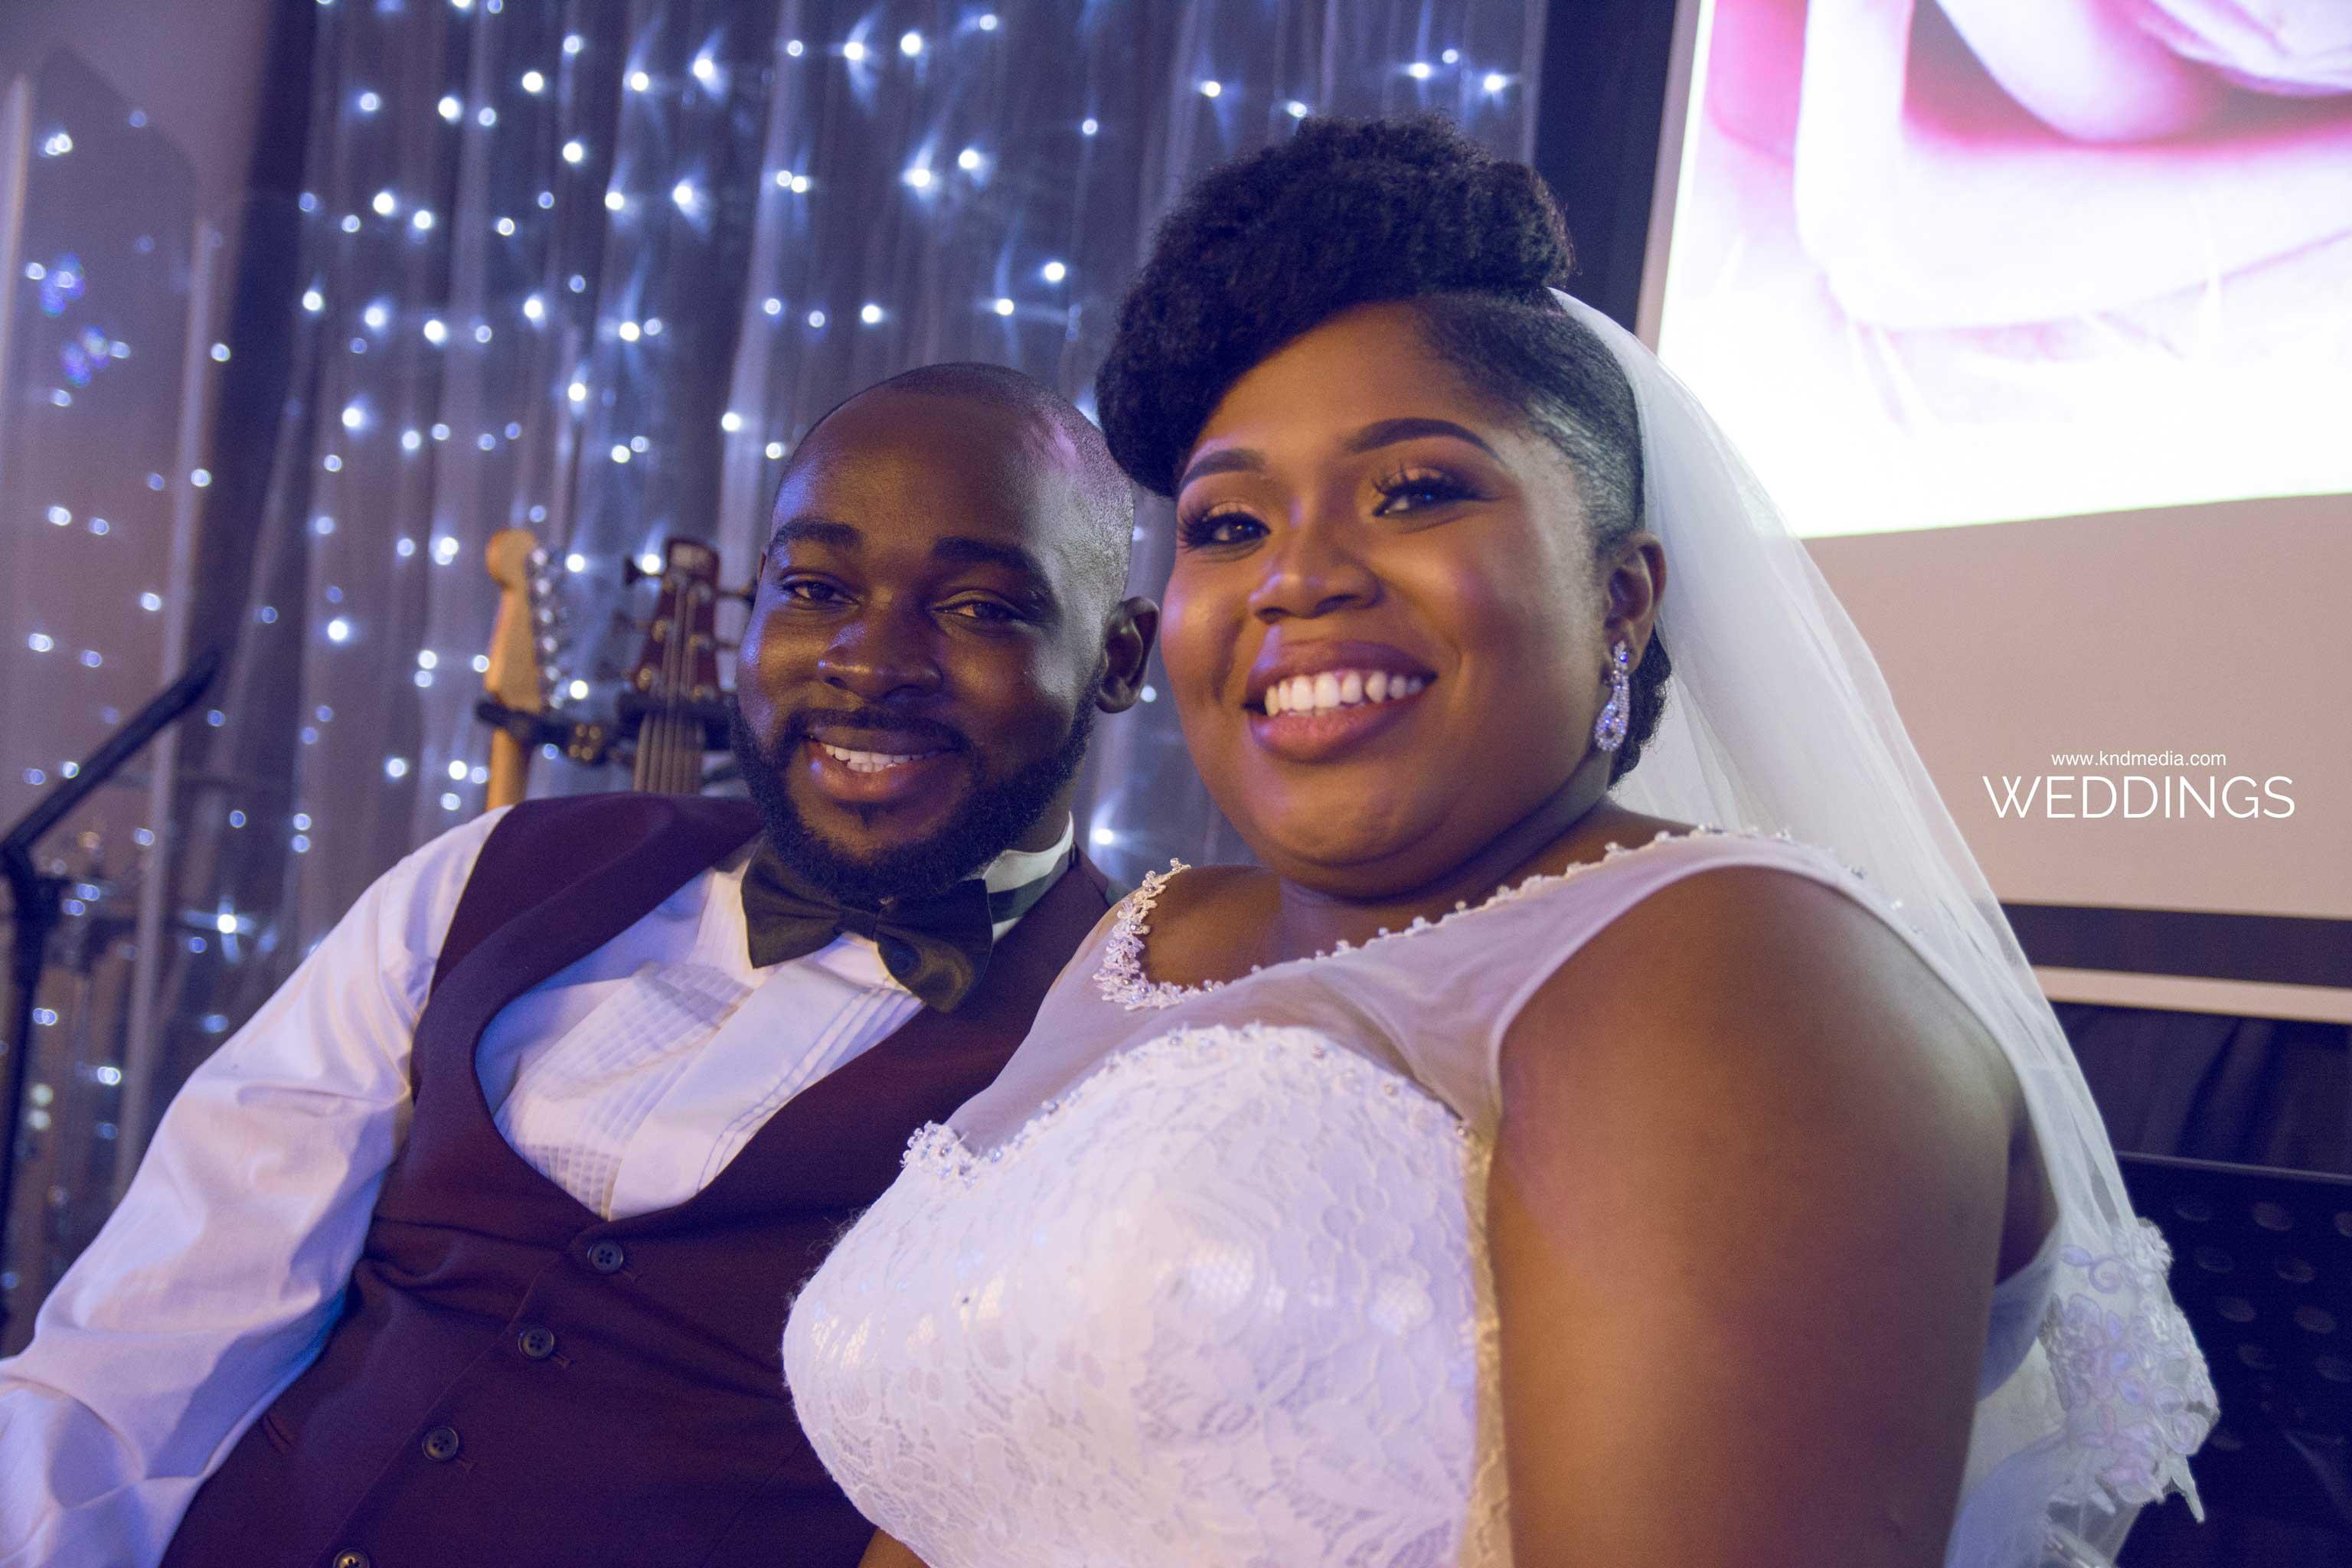 KND Media Weddings